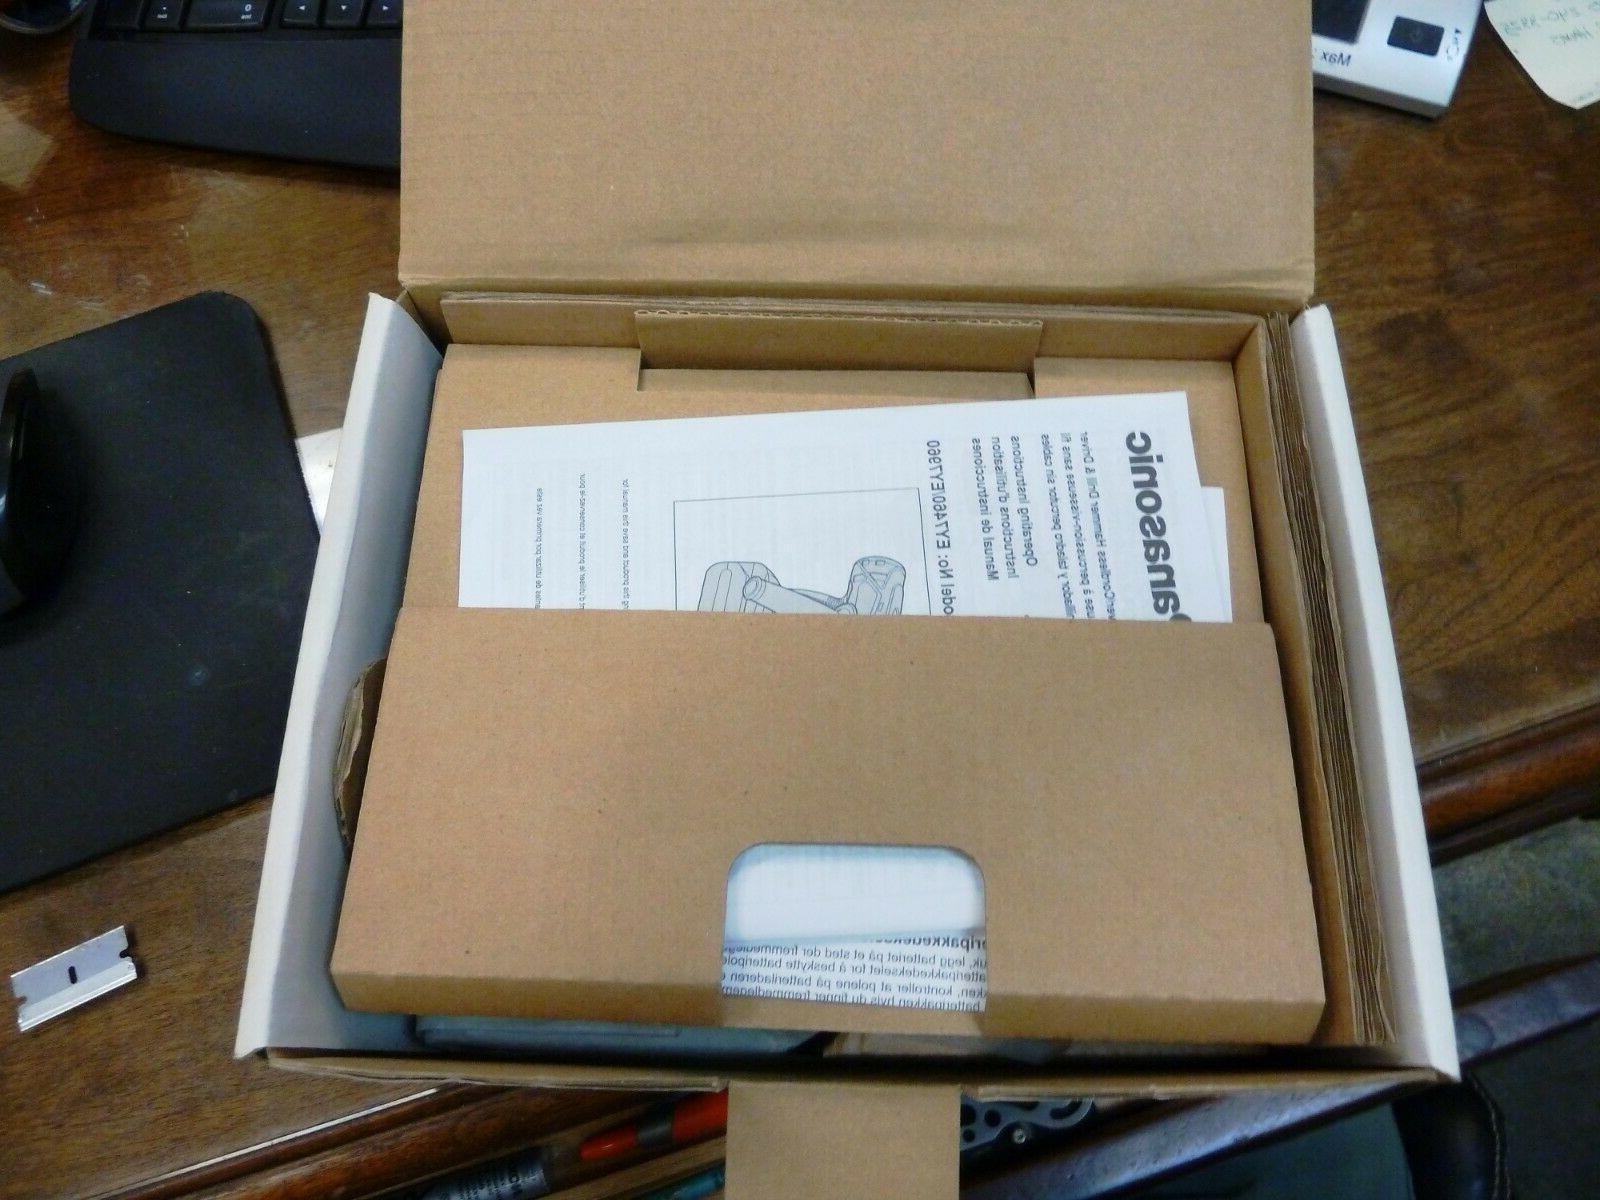 PANASONIC X 21.6V Cordless Bare Tool, in the Box